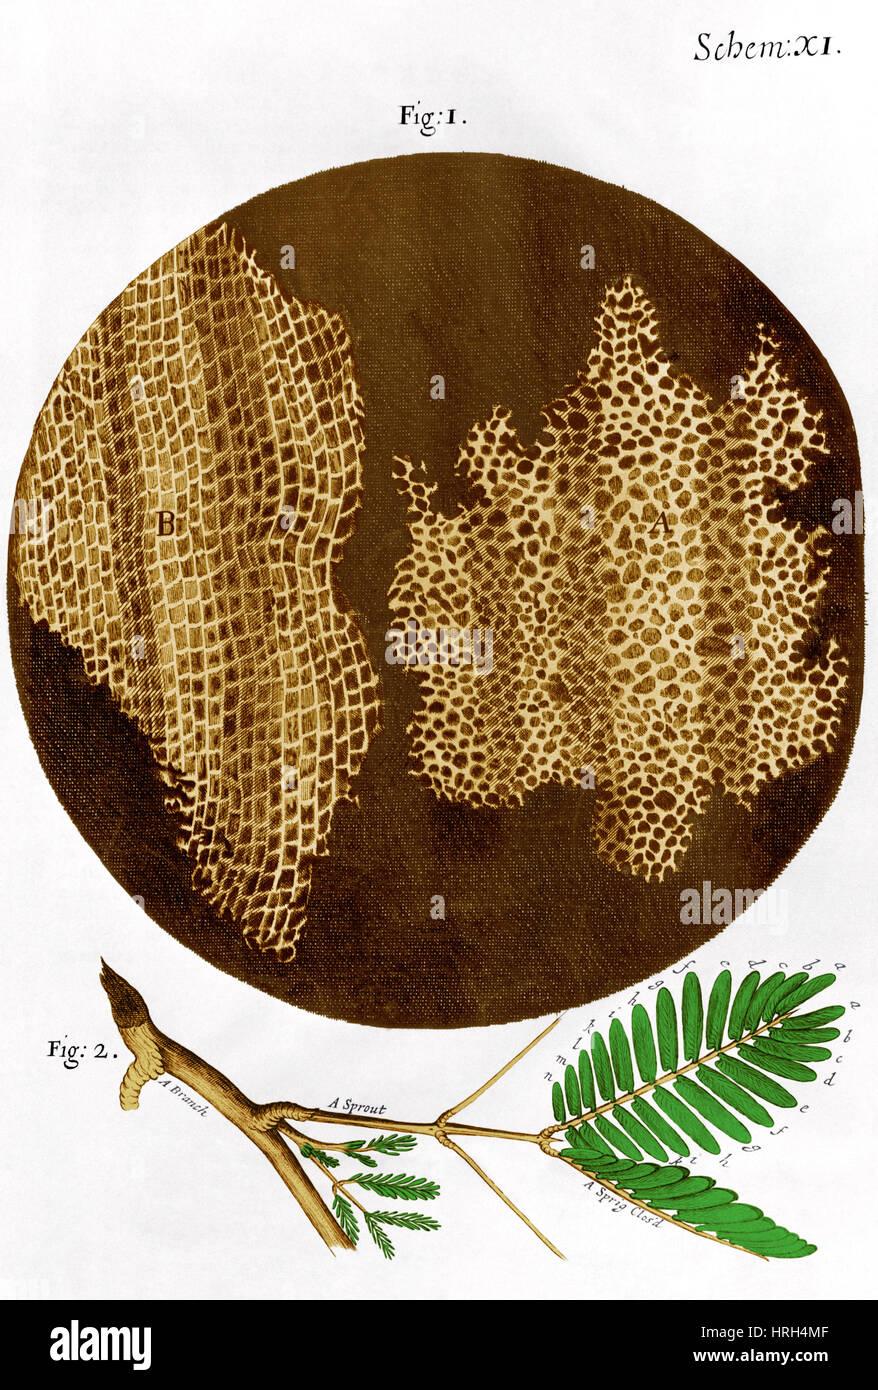 Illustration of cork wood cells Stock Photo